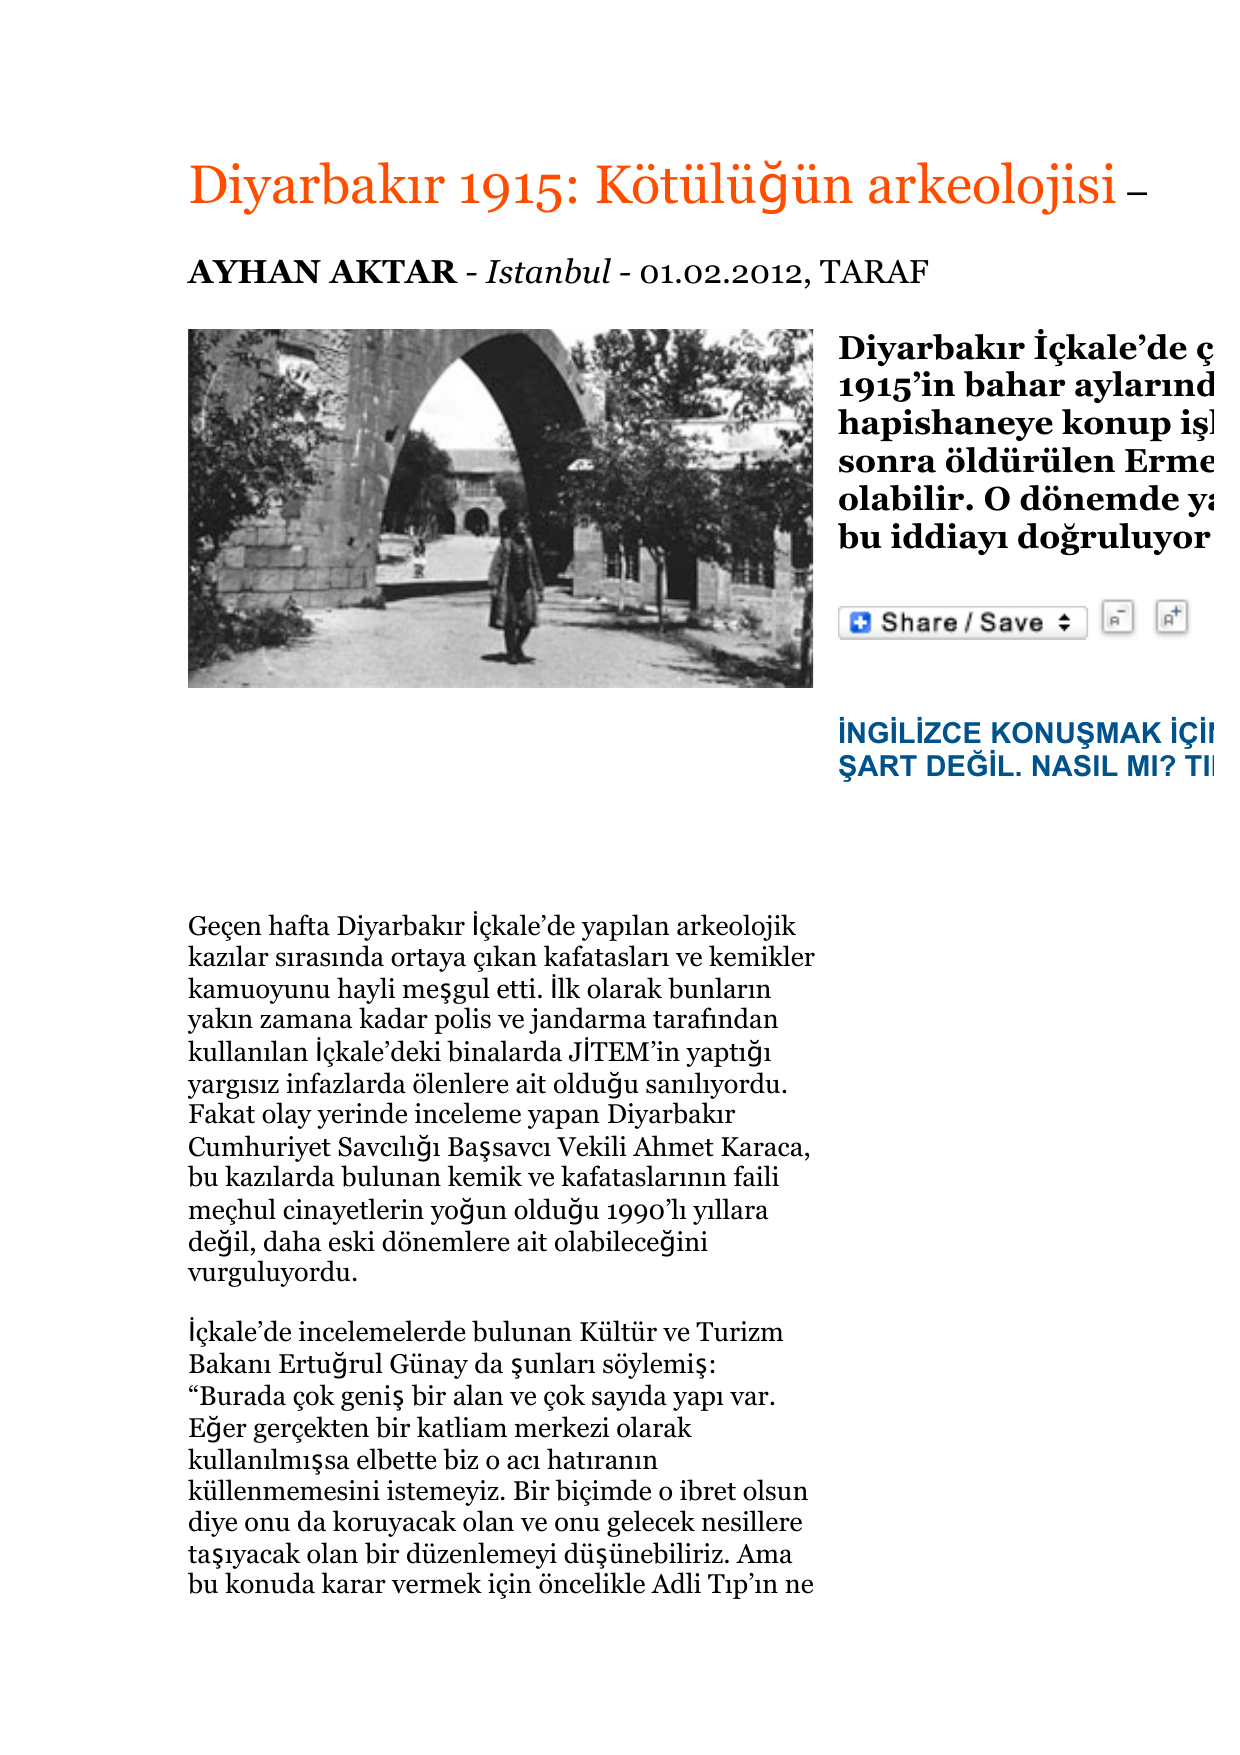 Diyarbakır 1915: Kötülüğün arkeolojisi